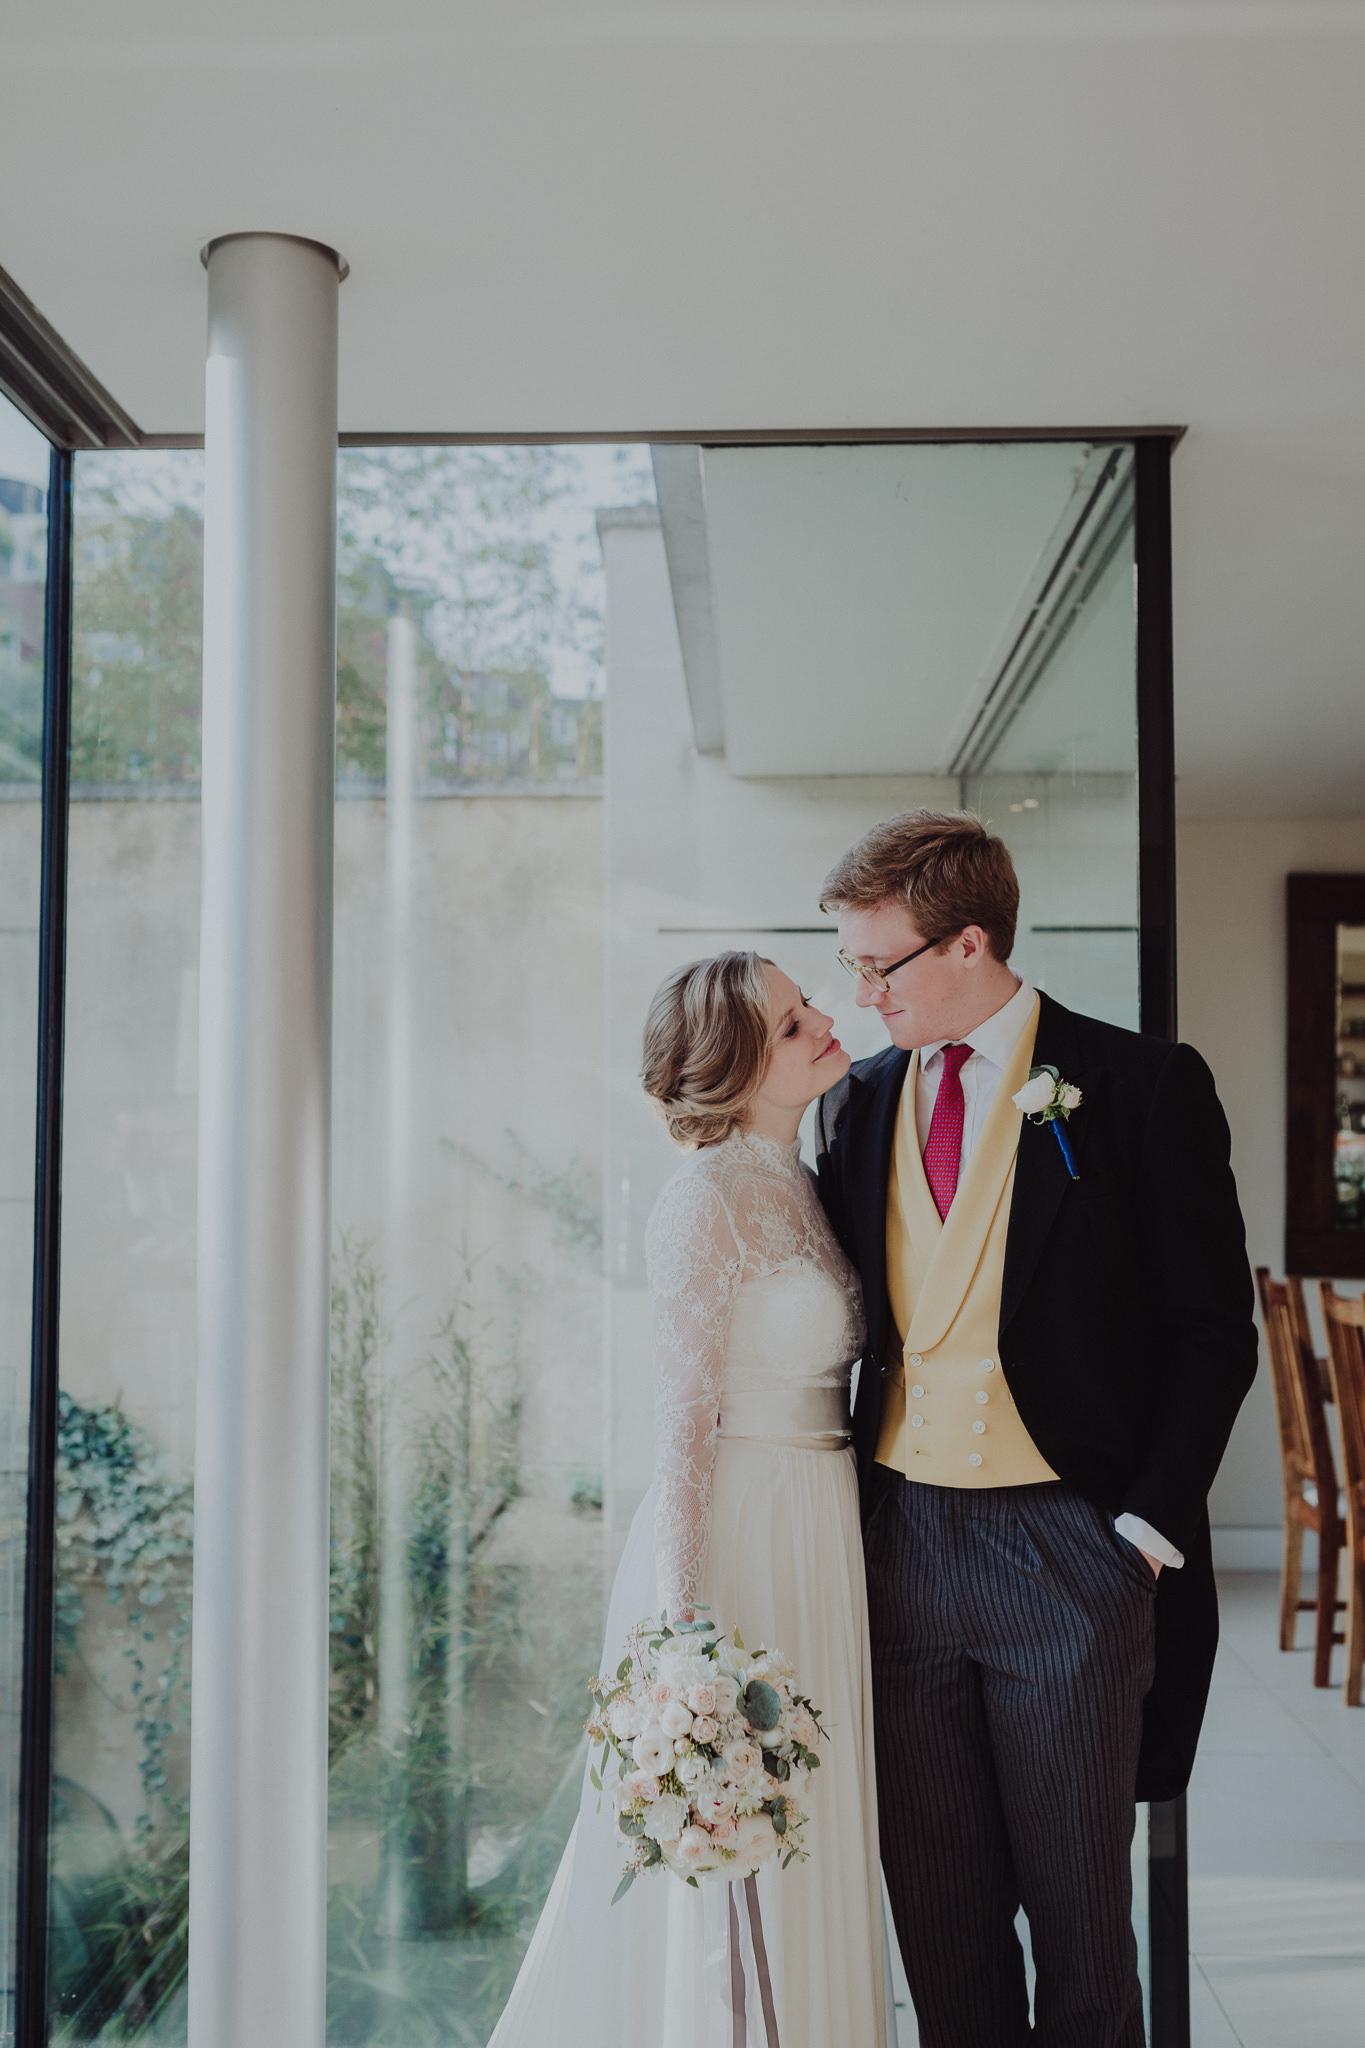 hampstead_wedding_photography_kate_gray-19.jpg